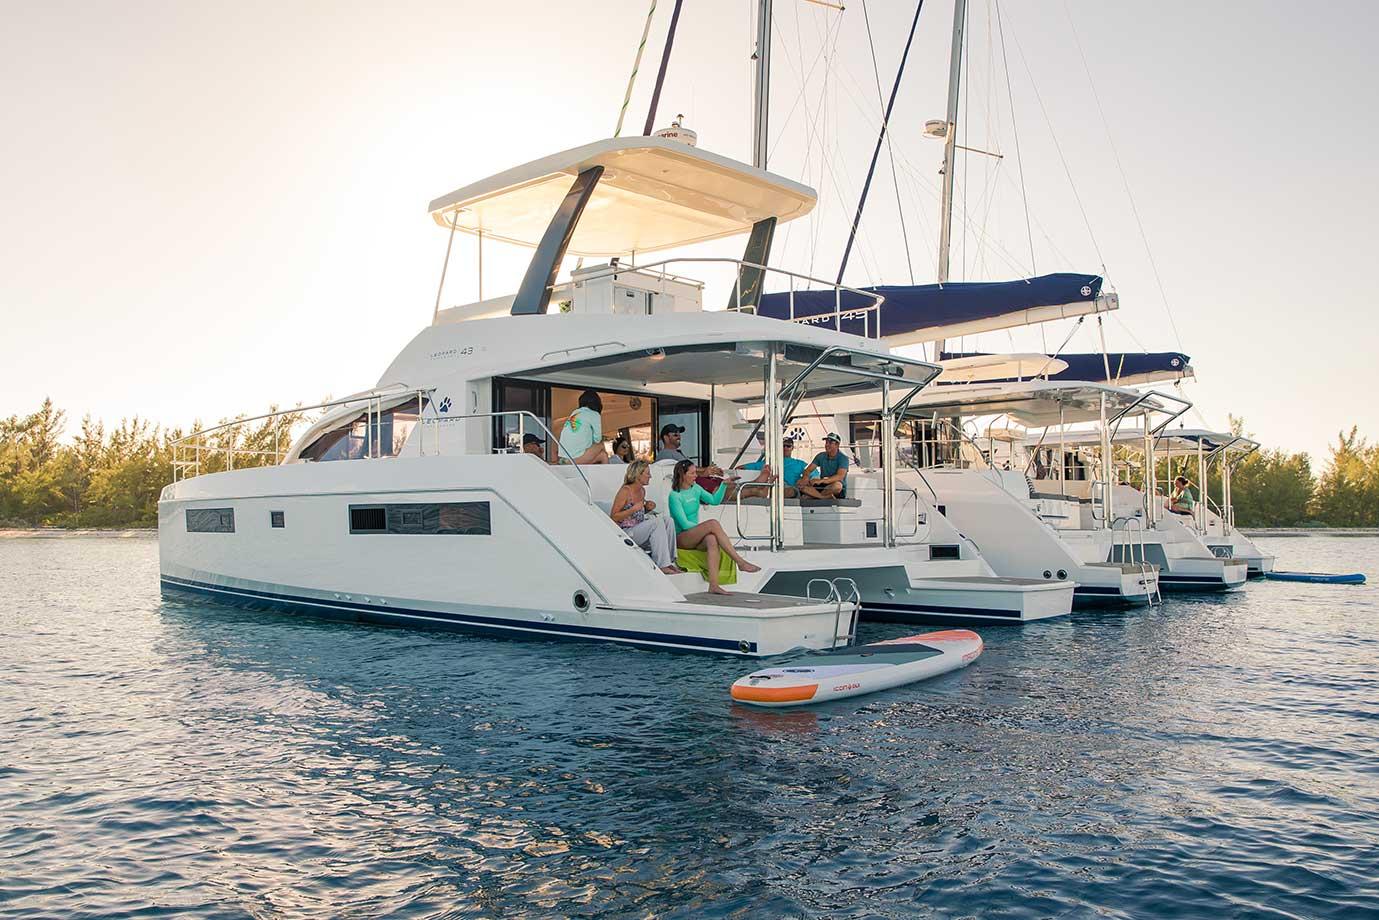 Leopard Catamarans Lifestyle Shoot: Bimini Islands - Nautique tv